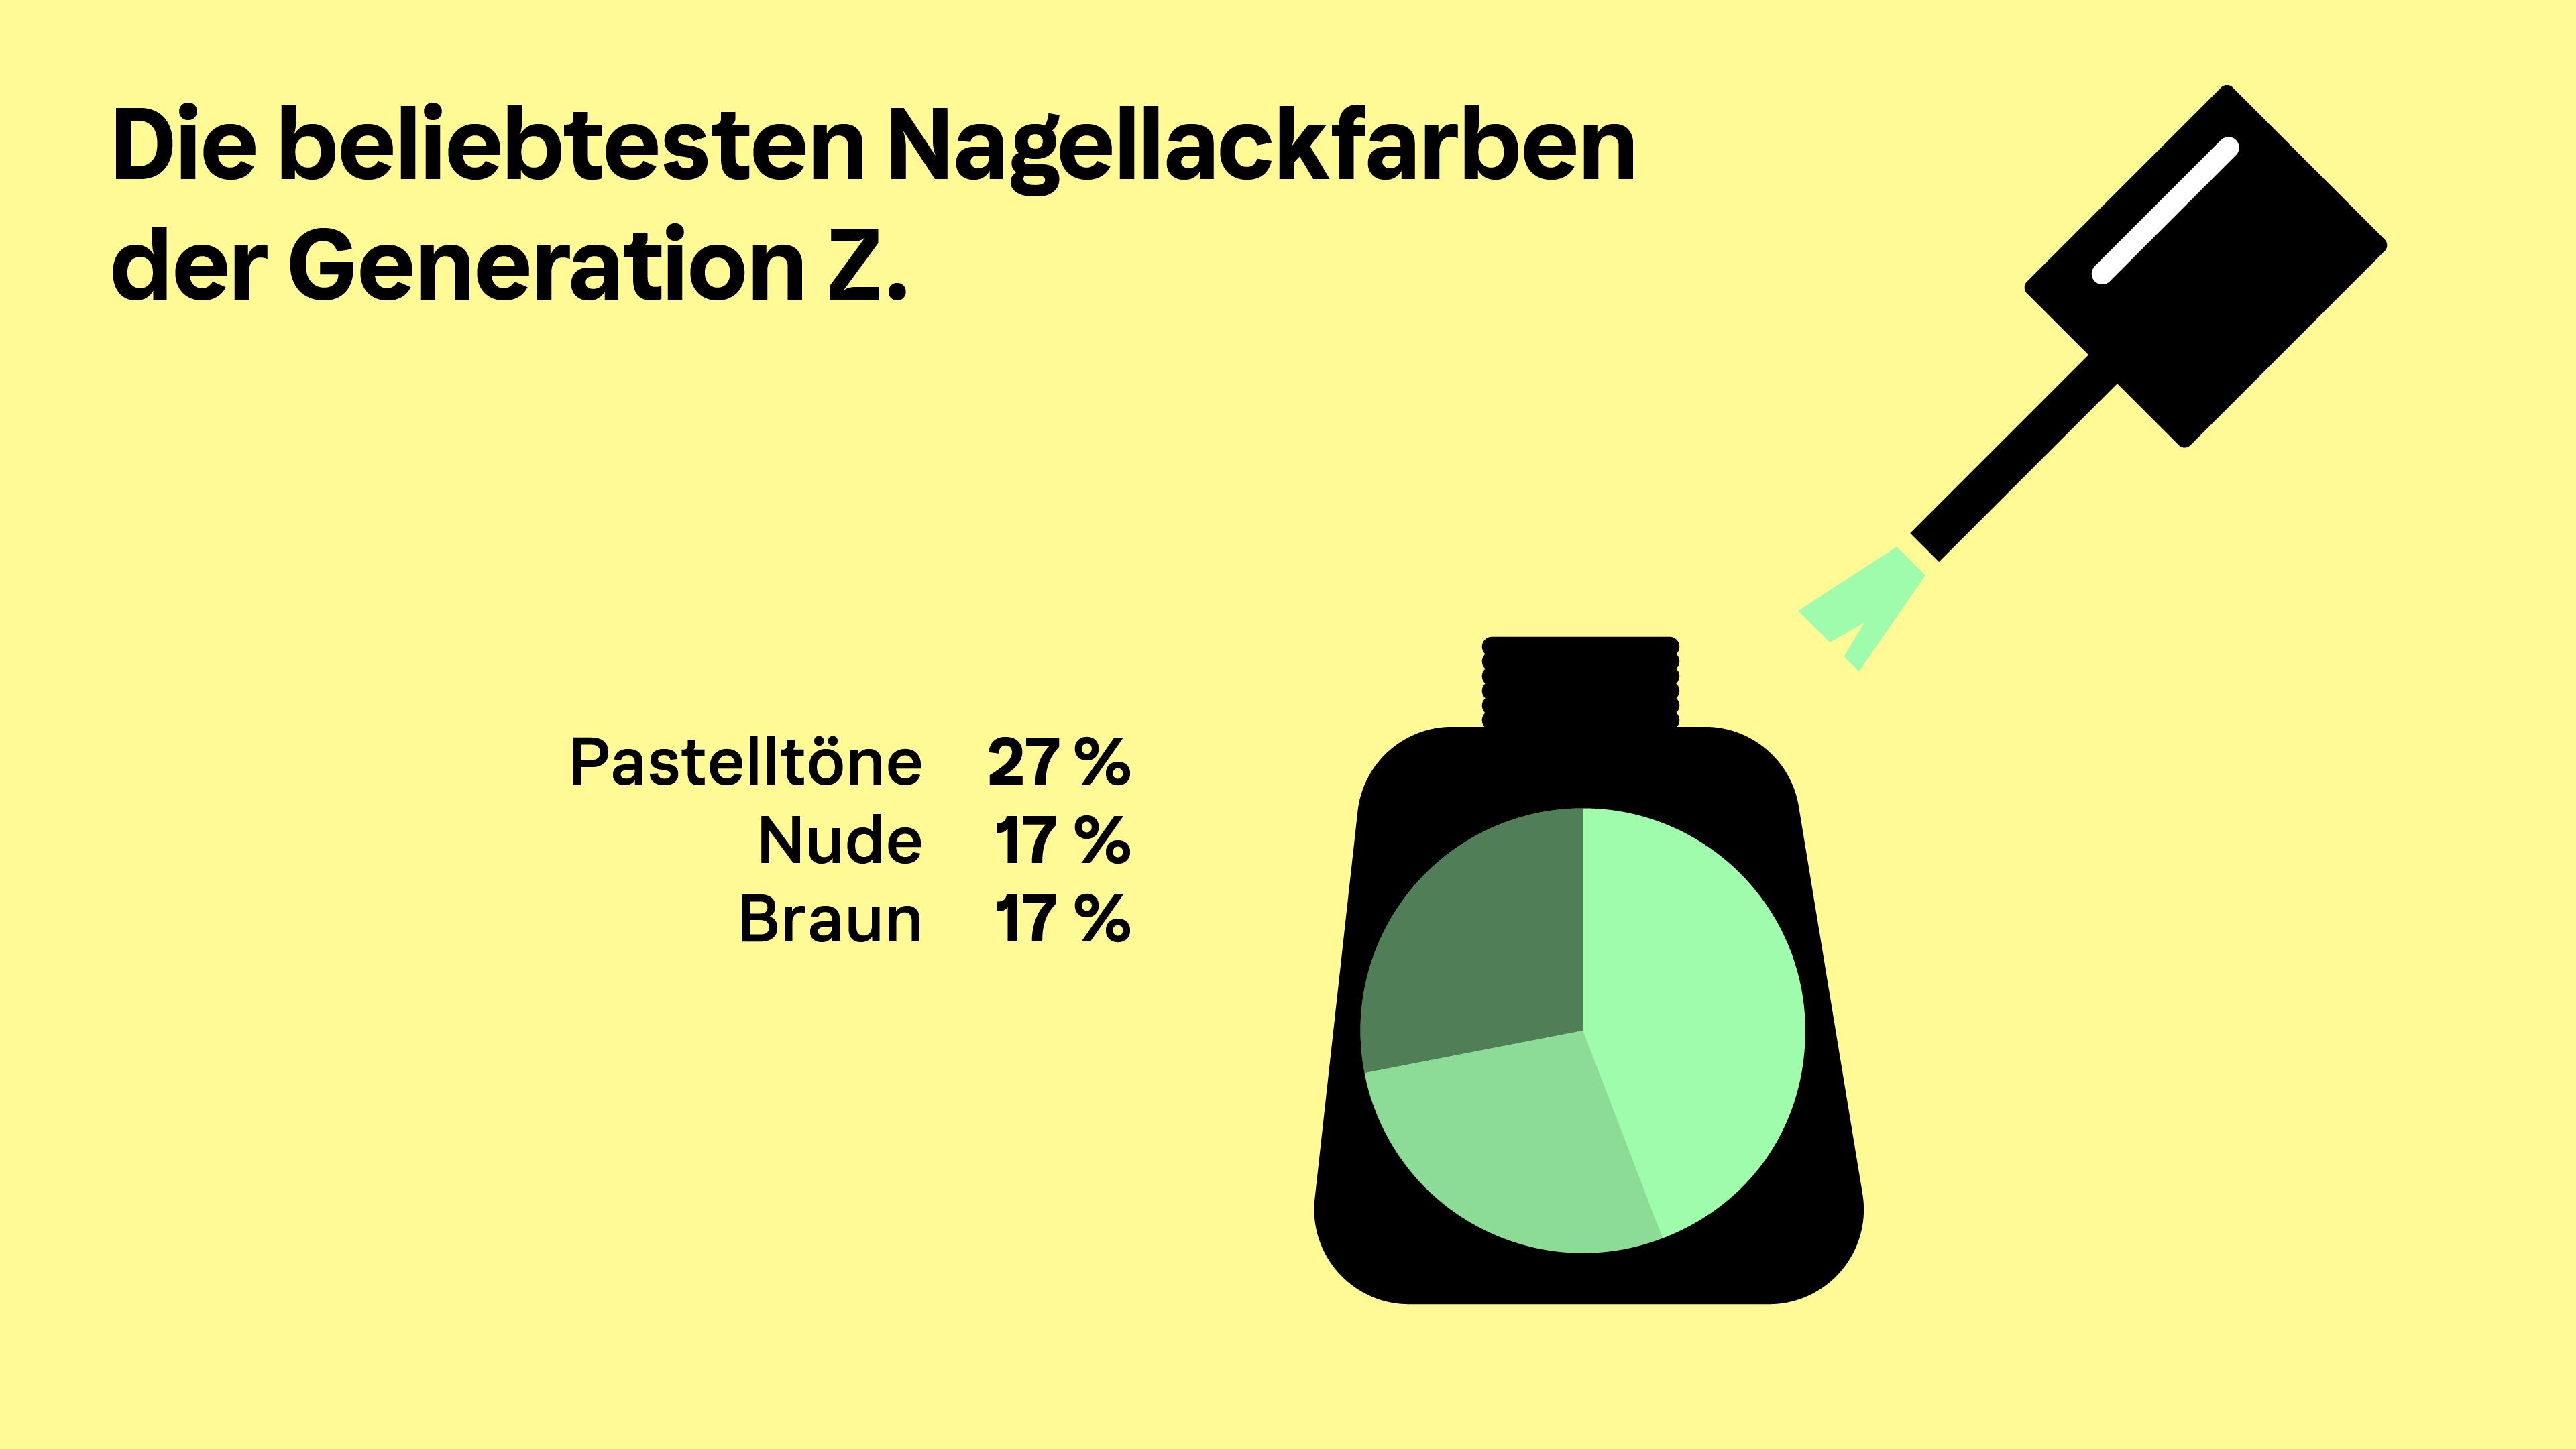 Infografik des Klarna Trendreport Beauty zum Thema beliebteste Nagellackfarben der Gen Z